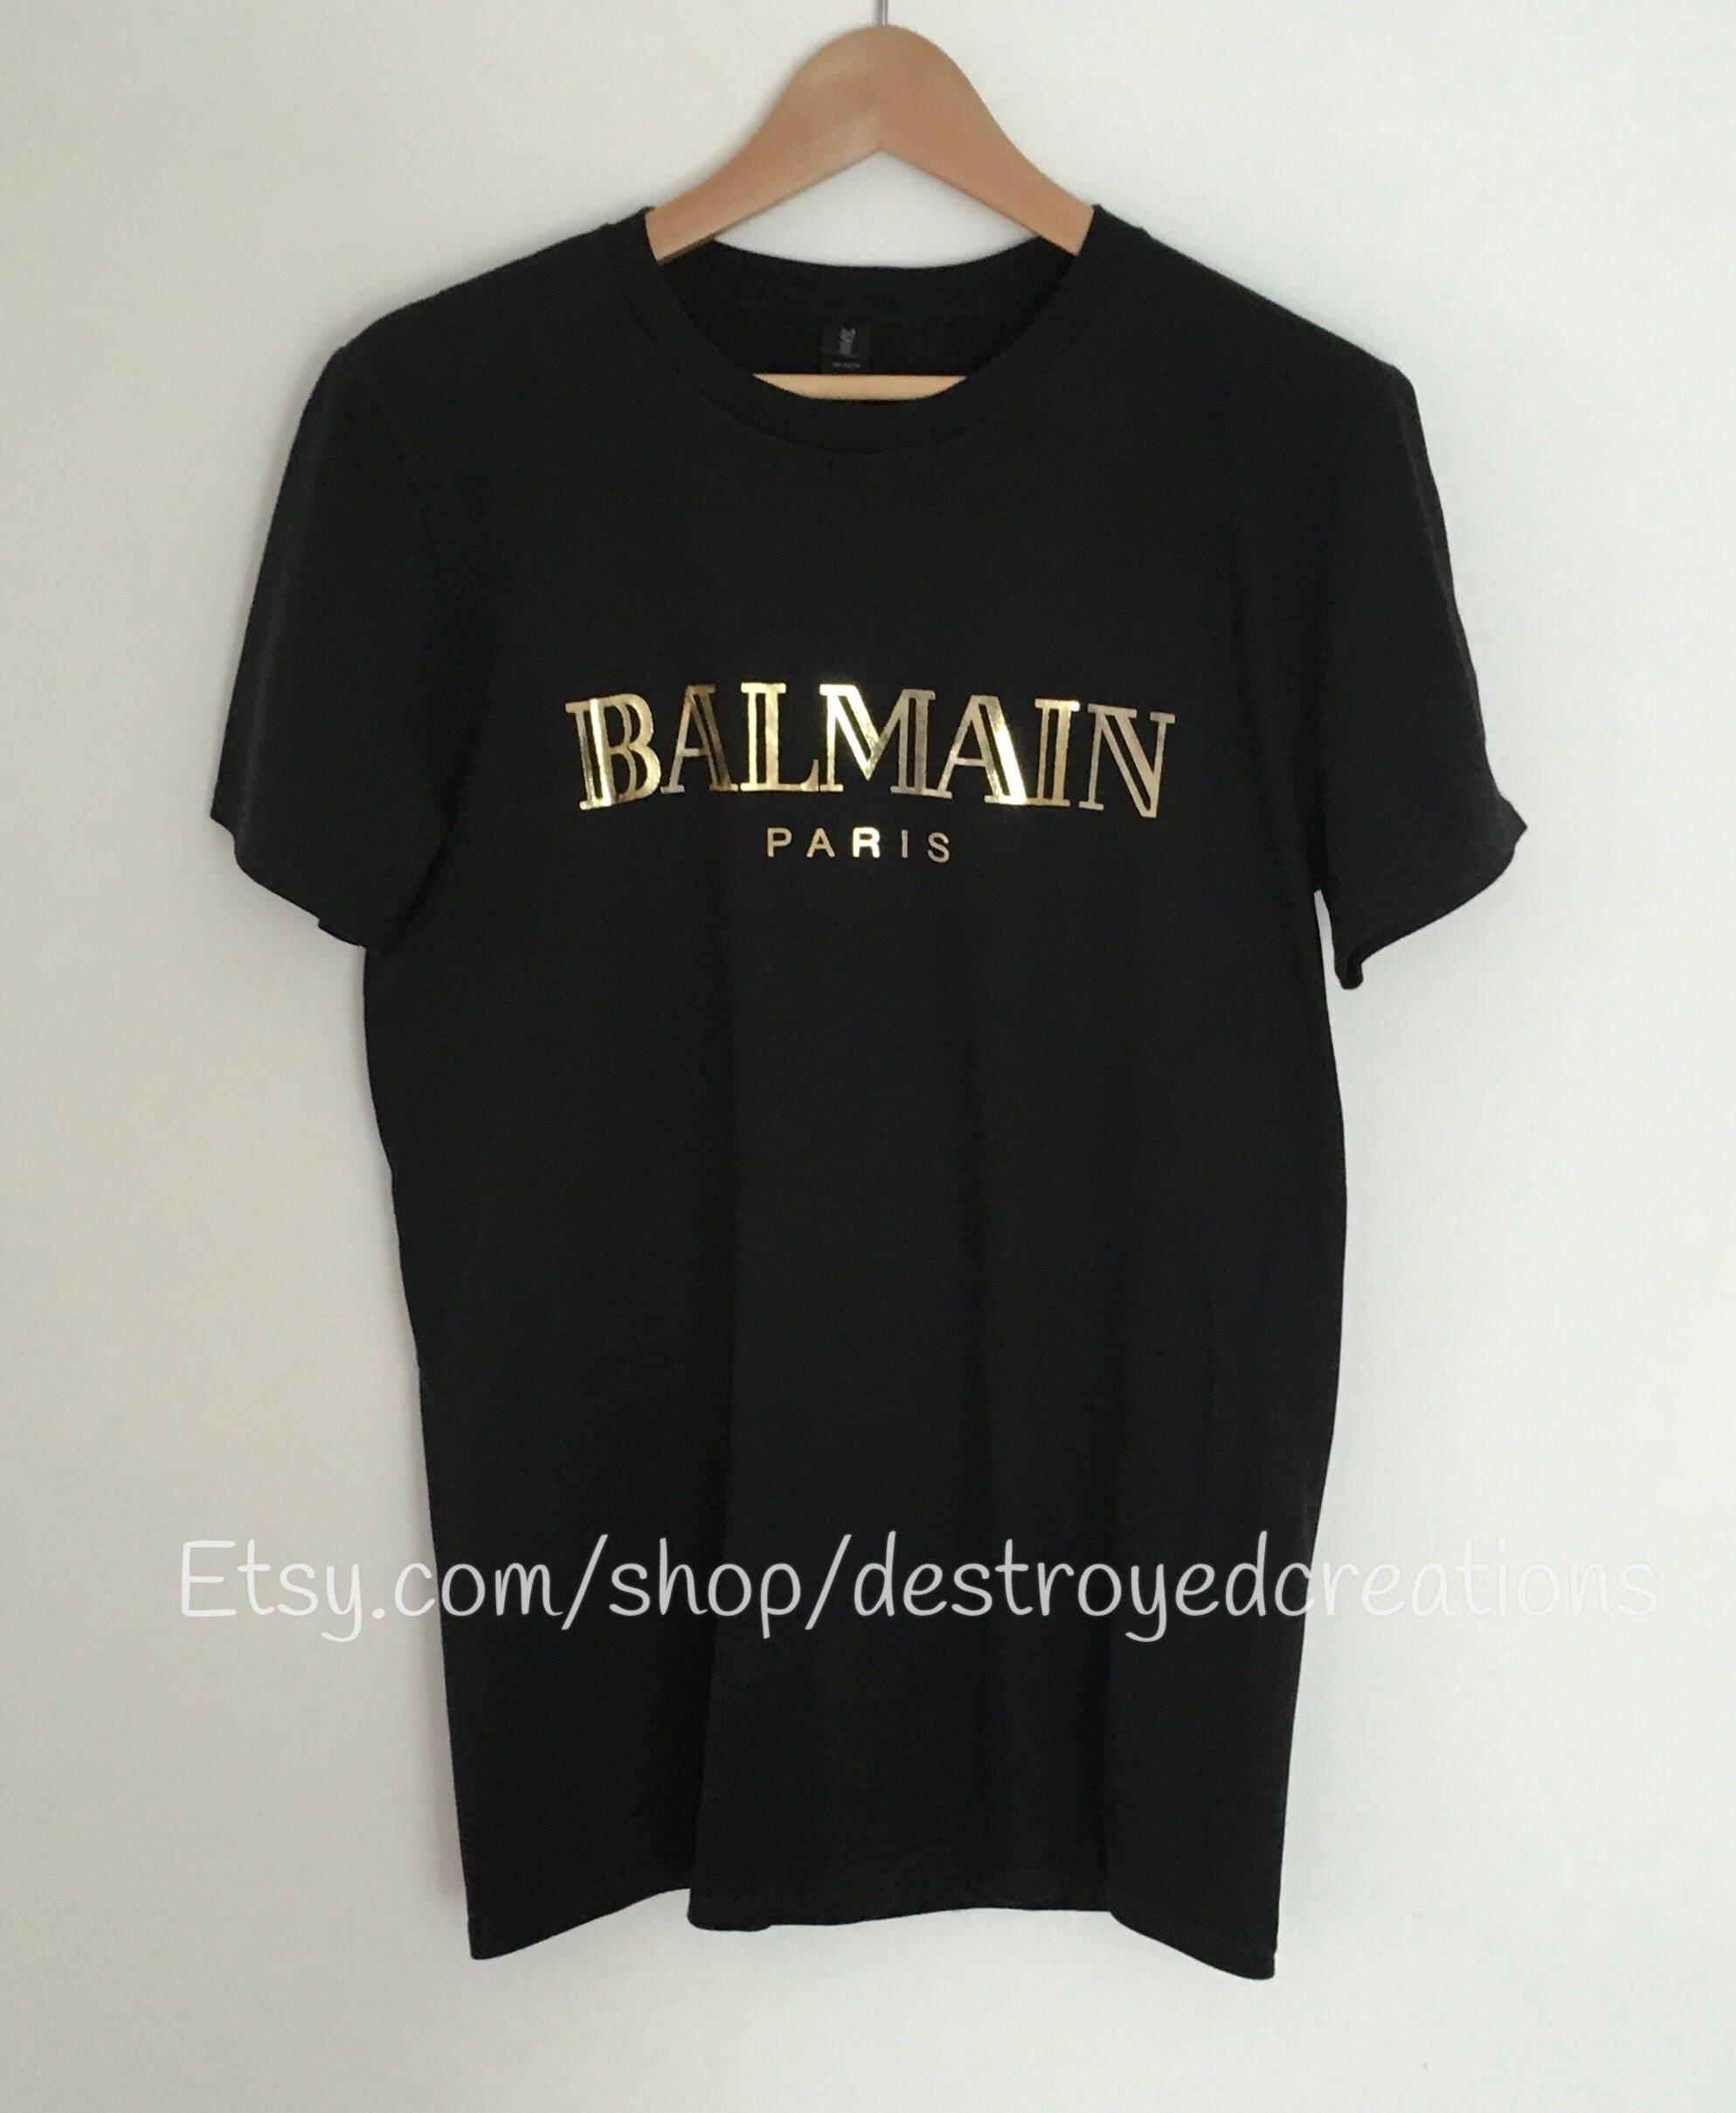 balmain paris black tee shirt gold foil balmain gucci inspired. Black Bedroom Furniture Sets. Home Design Ideas